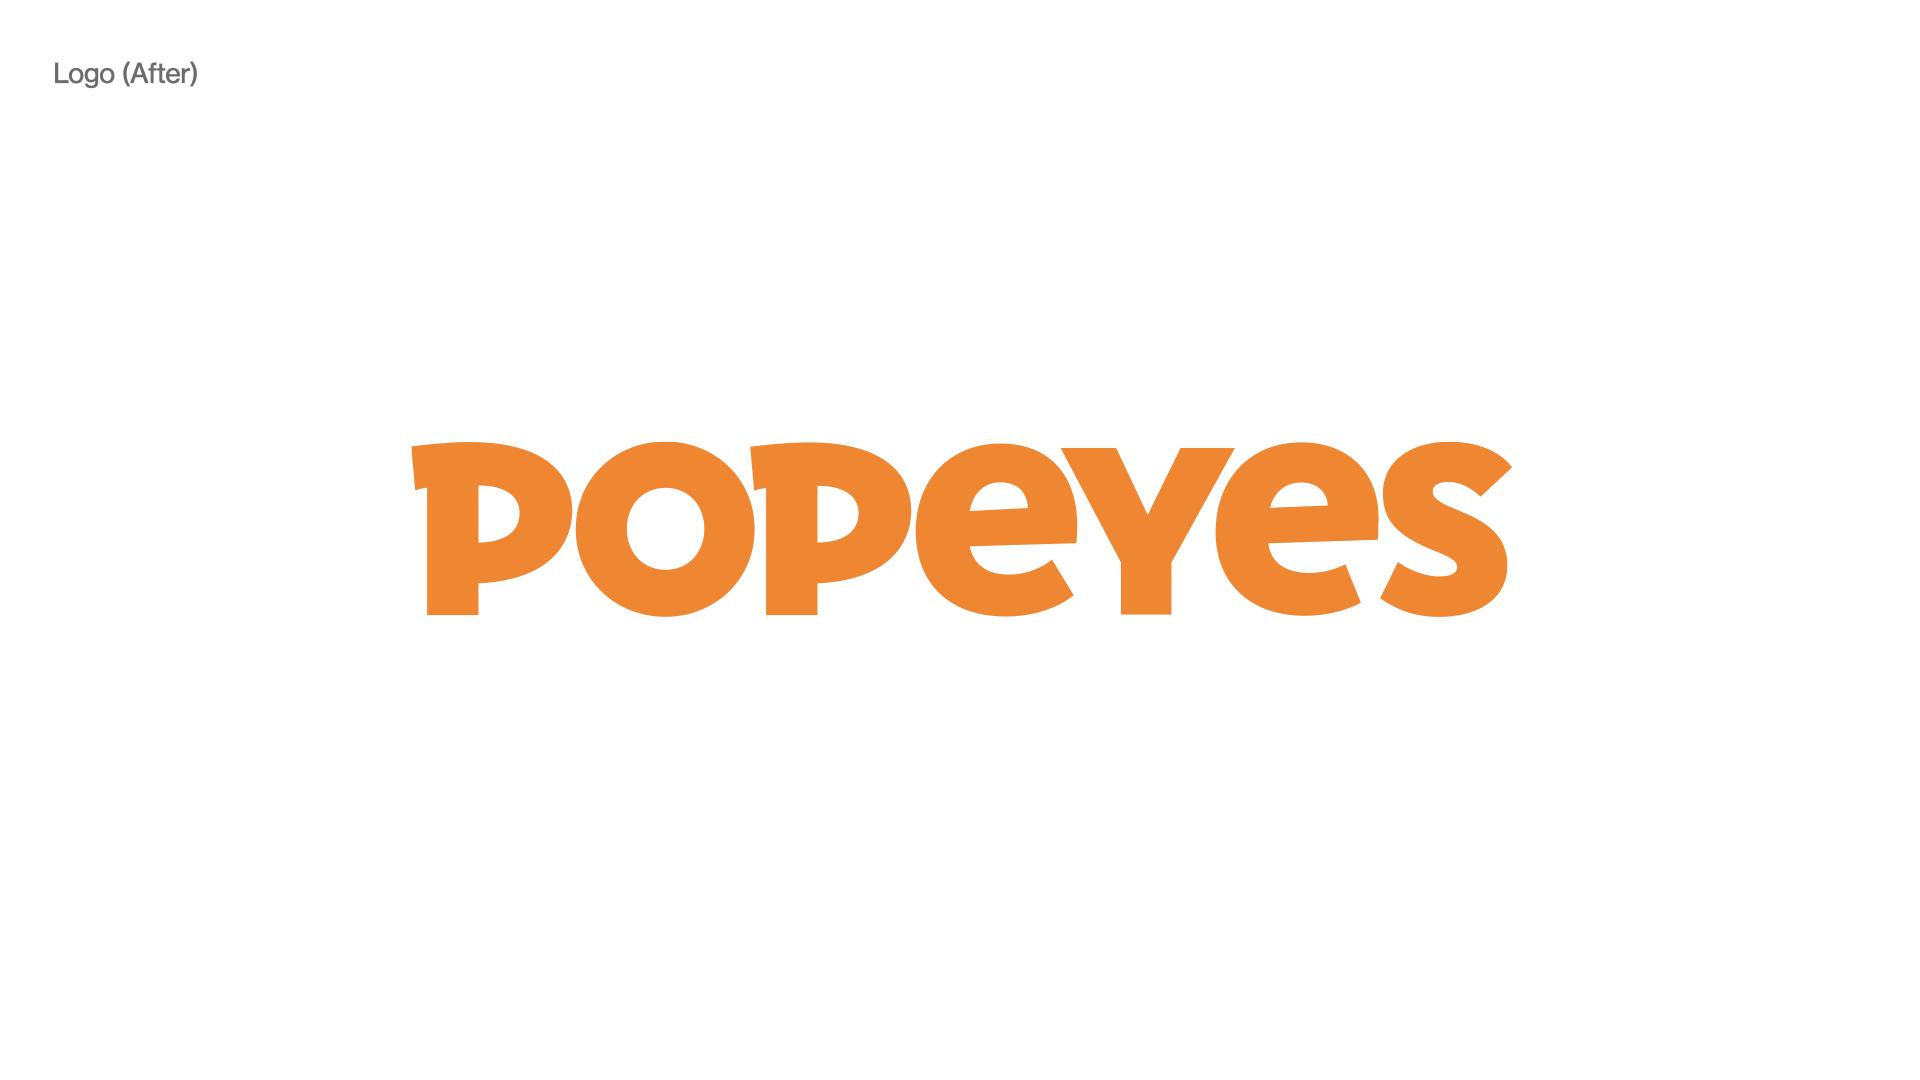 Popeyes_Rebranding.003